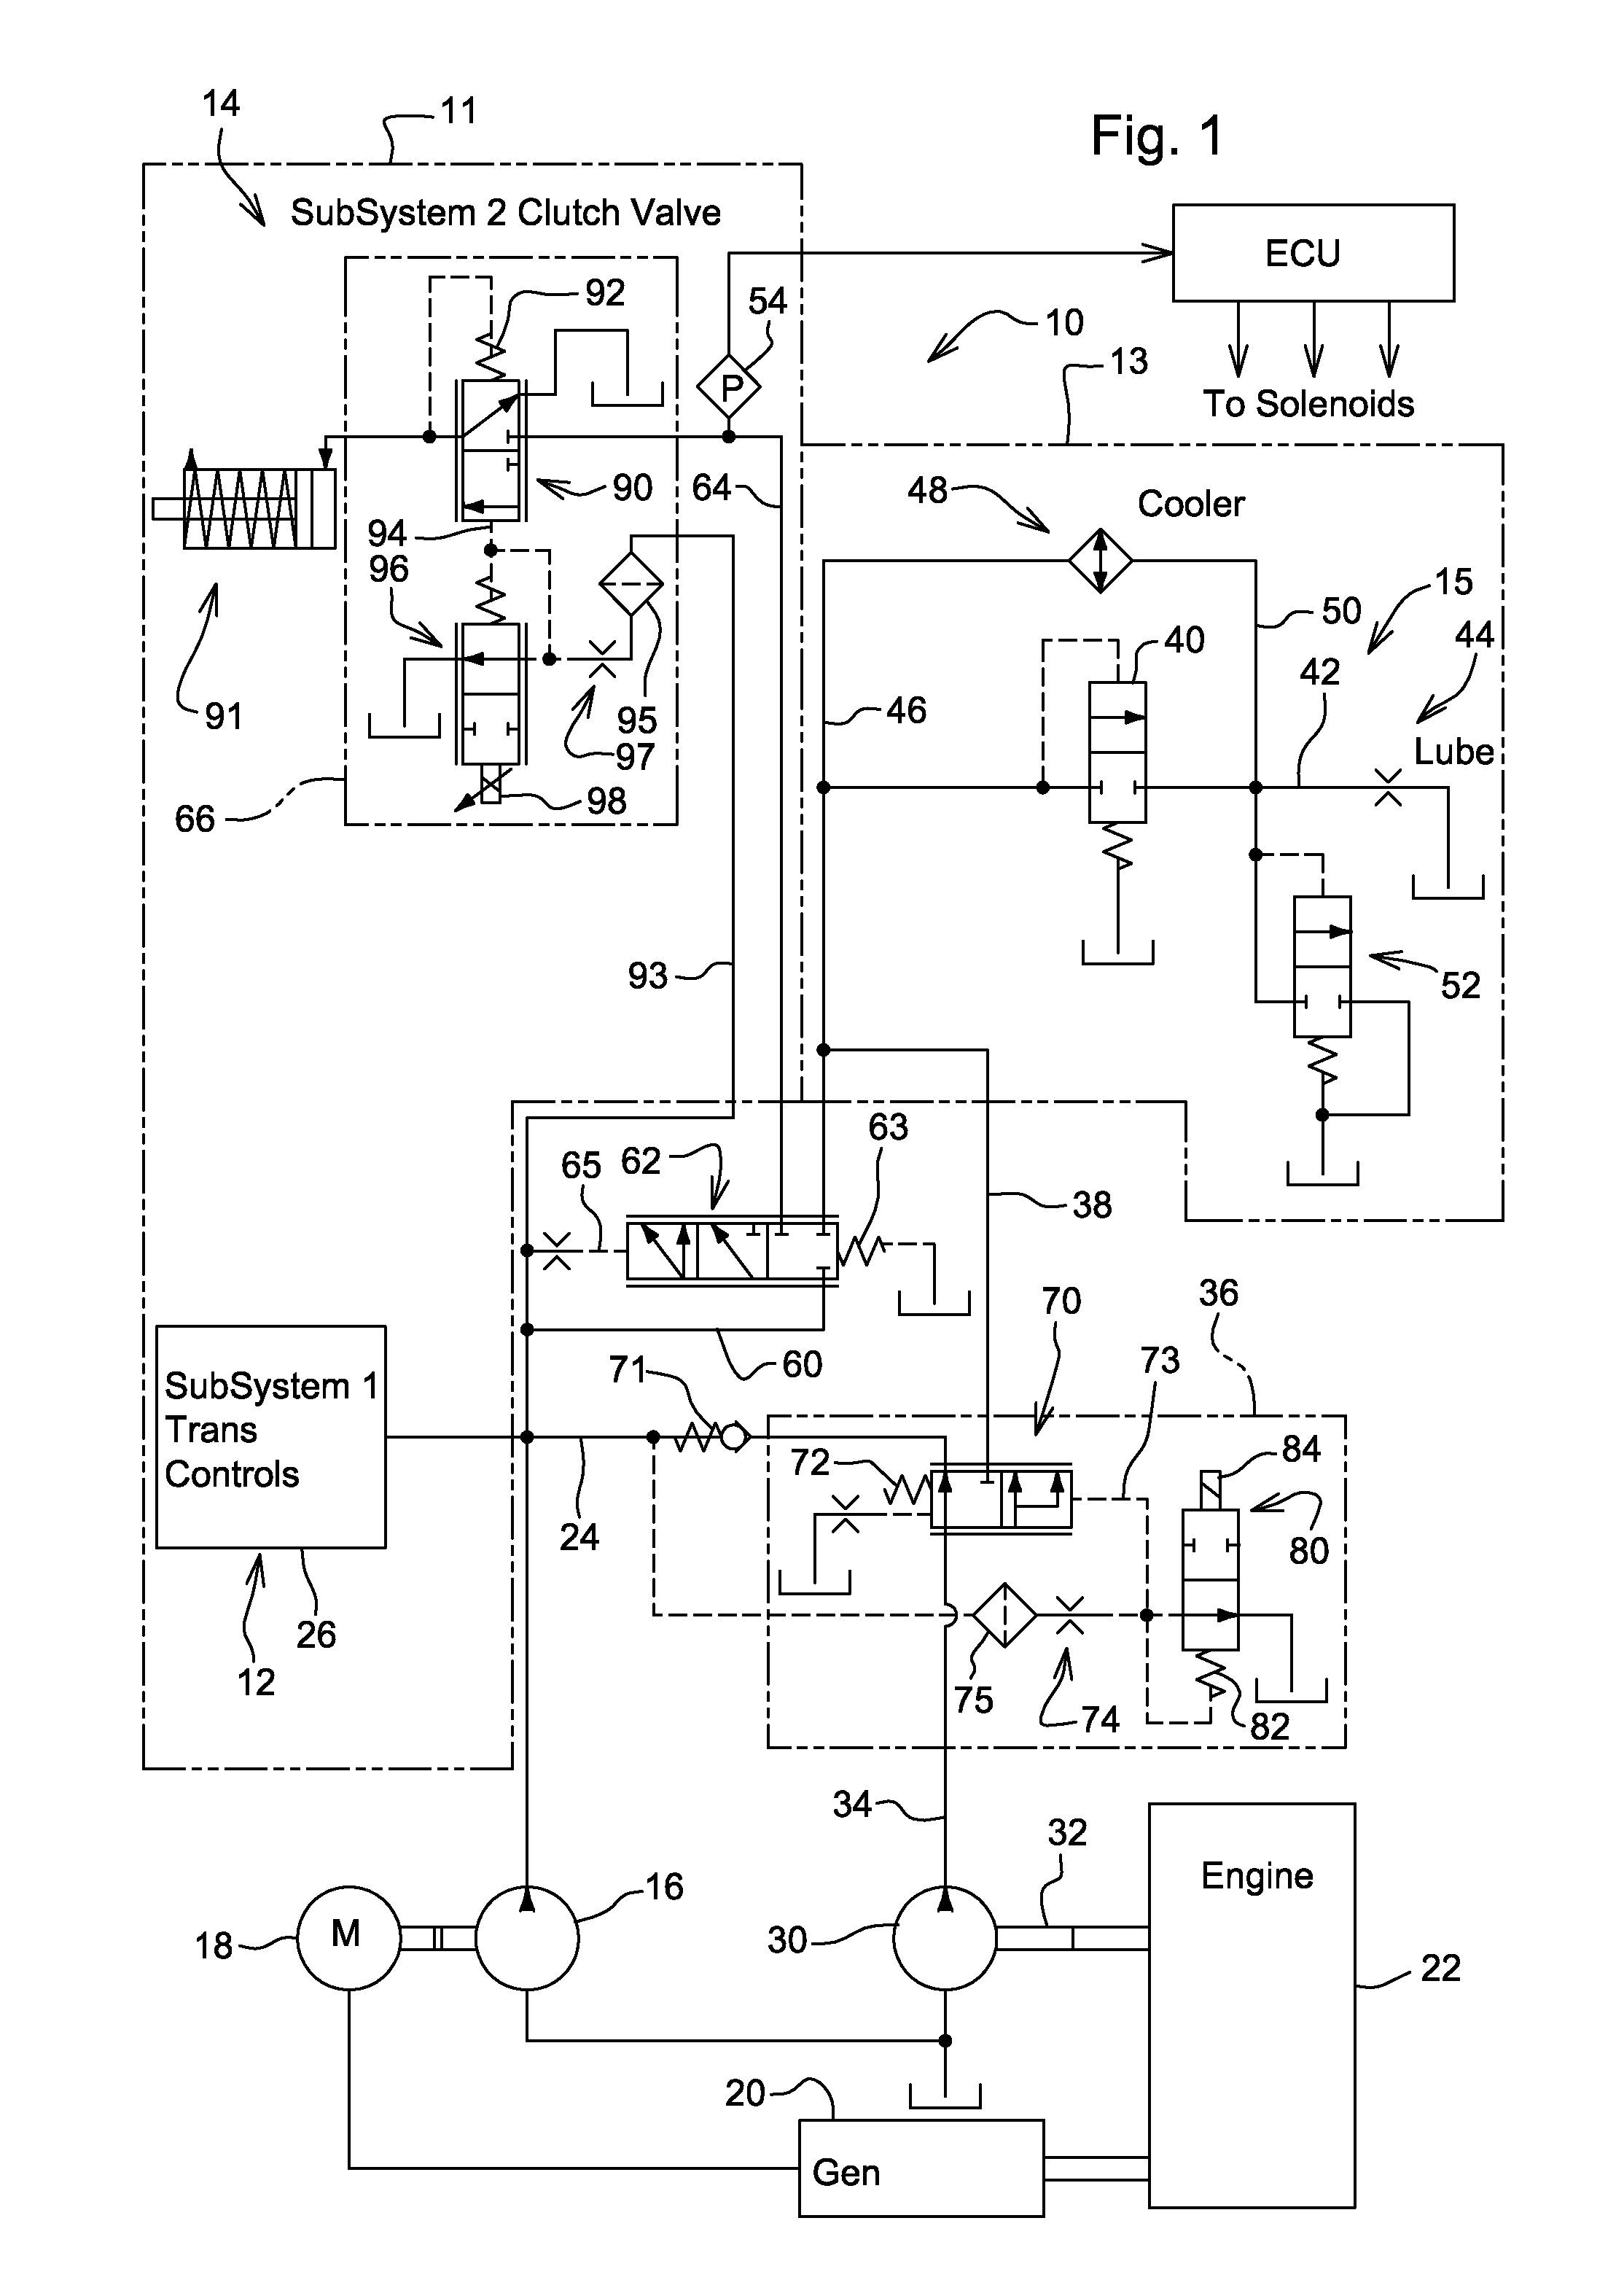 patent us8347618 - dual pump hydraulic system